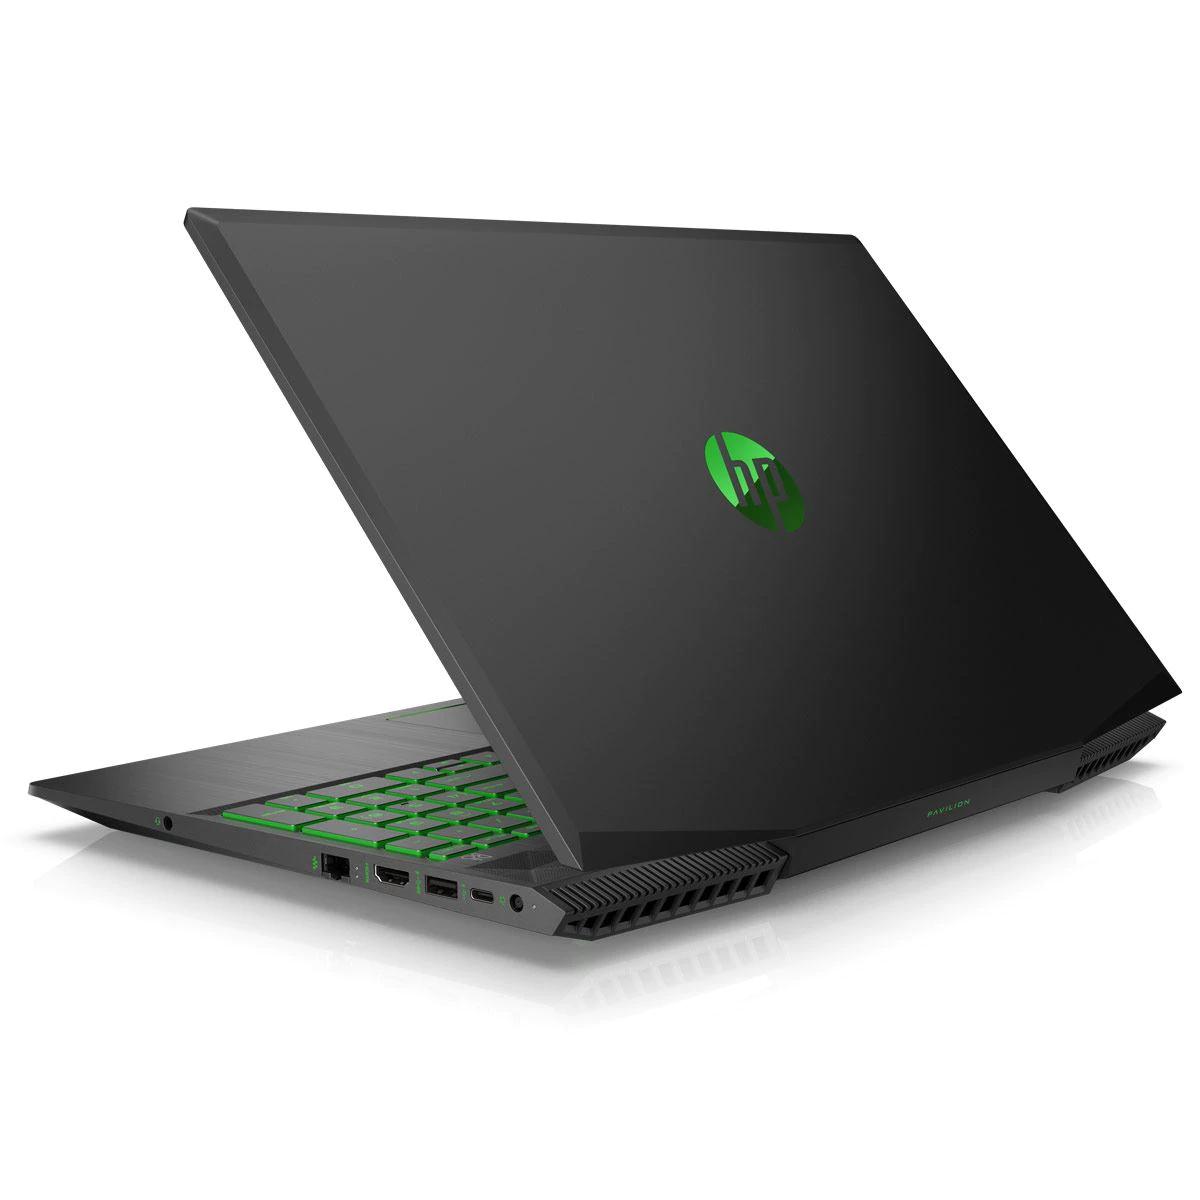 "Laptop Gamer hp 15-cx0001 i5 8300h 8ram 1tb gtx 1050 4gb win 10 home 15.6"""